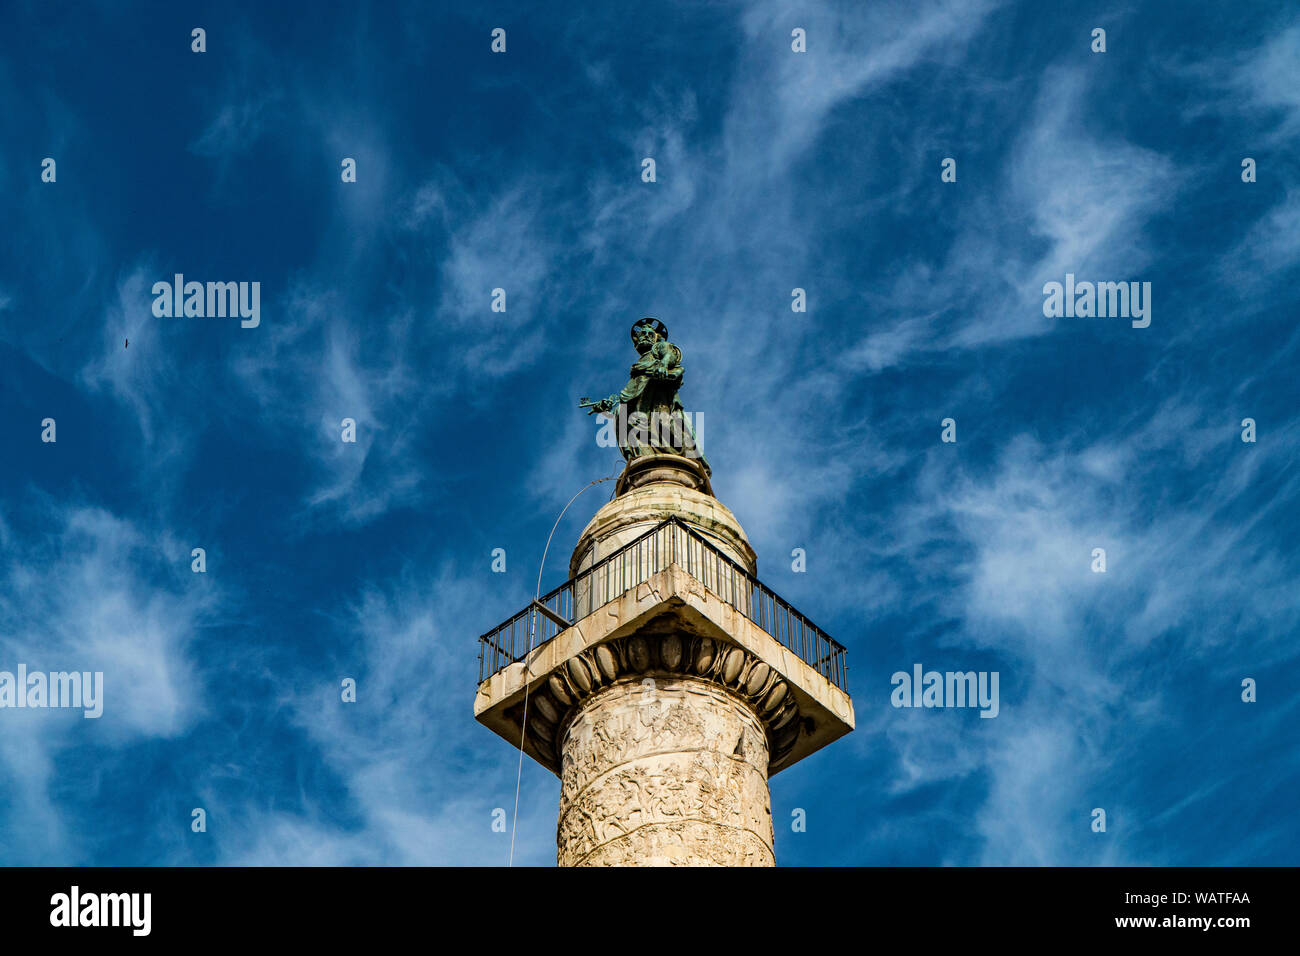 Trajan's Column (Colonna Traiana) in Rome, Italy. Stock Photo